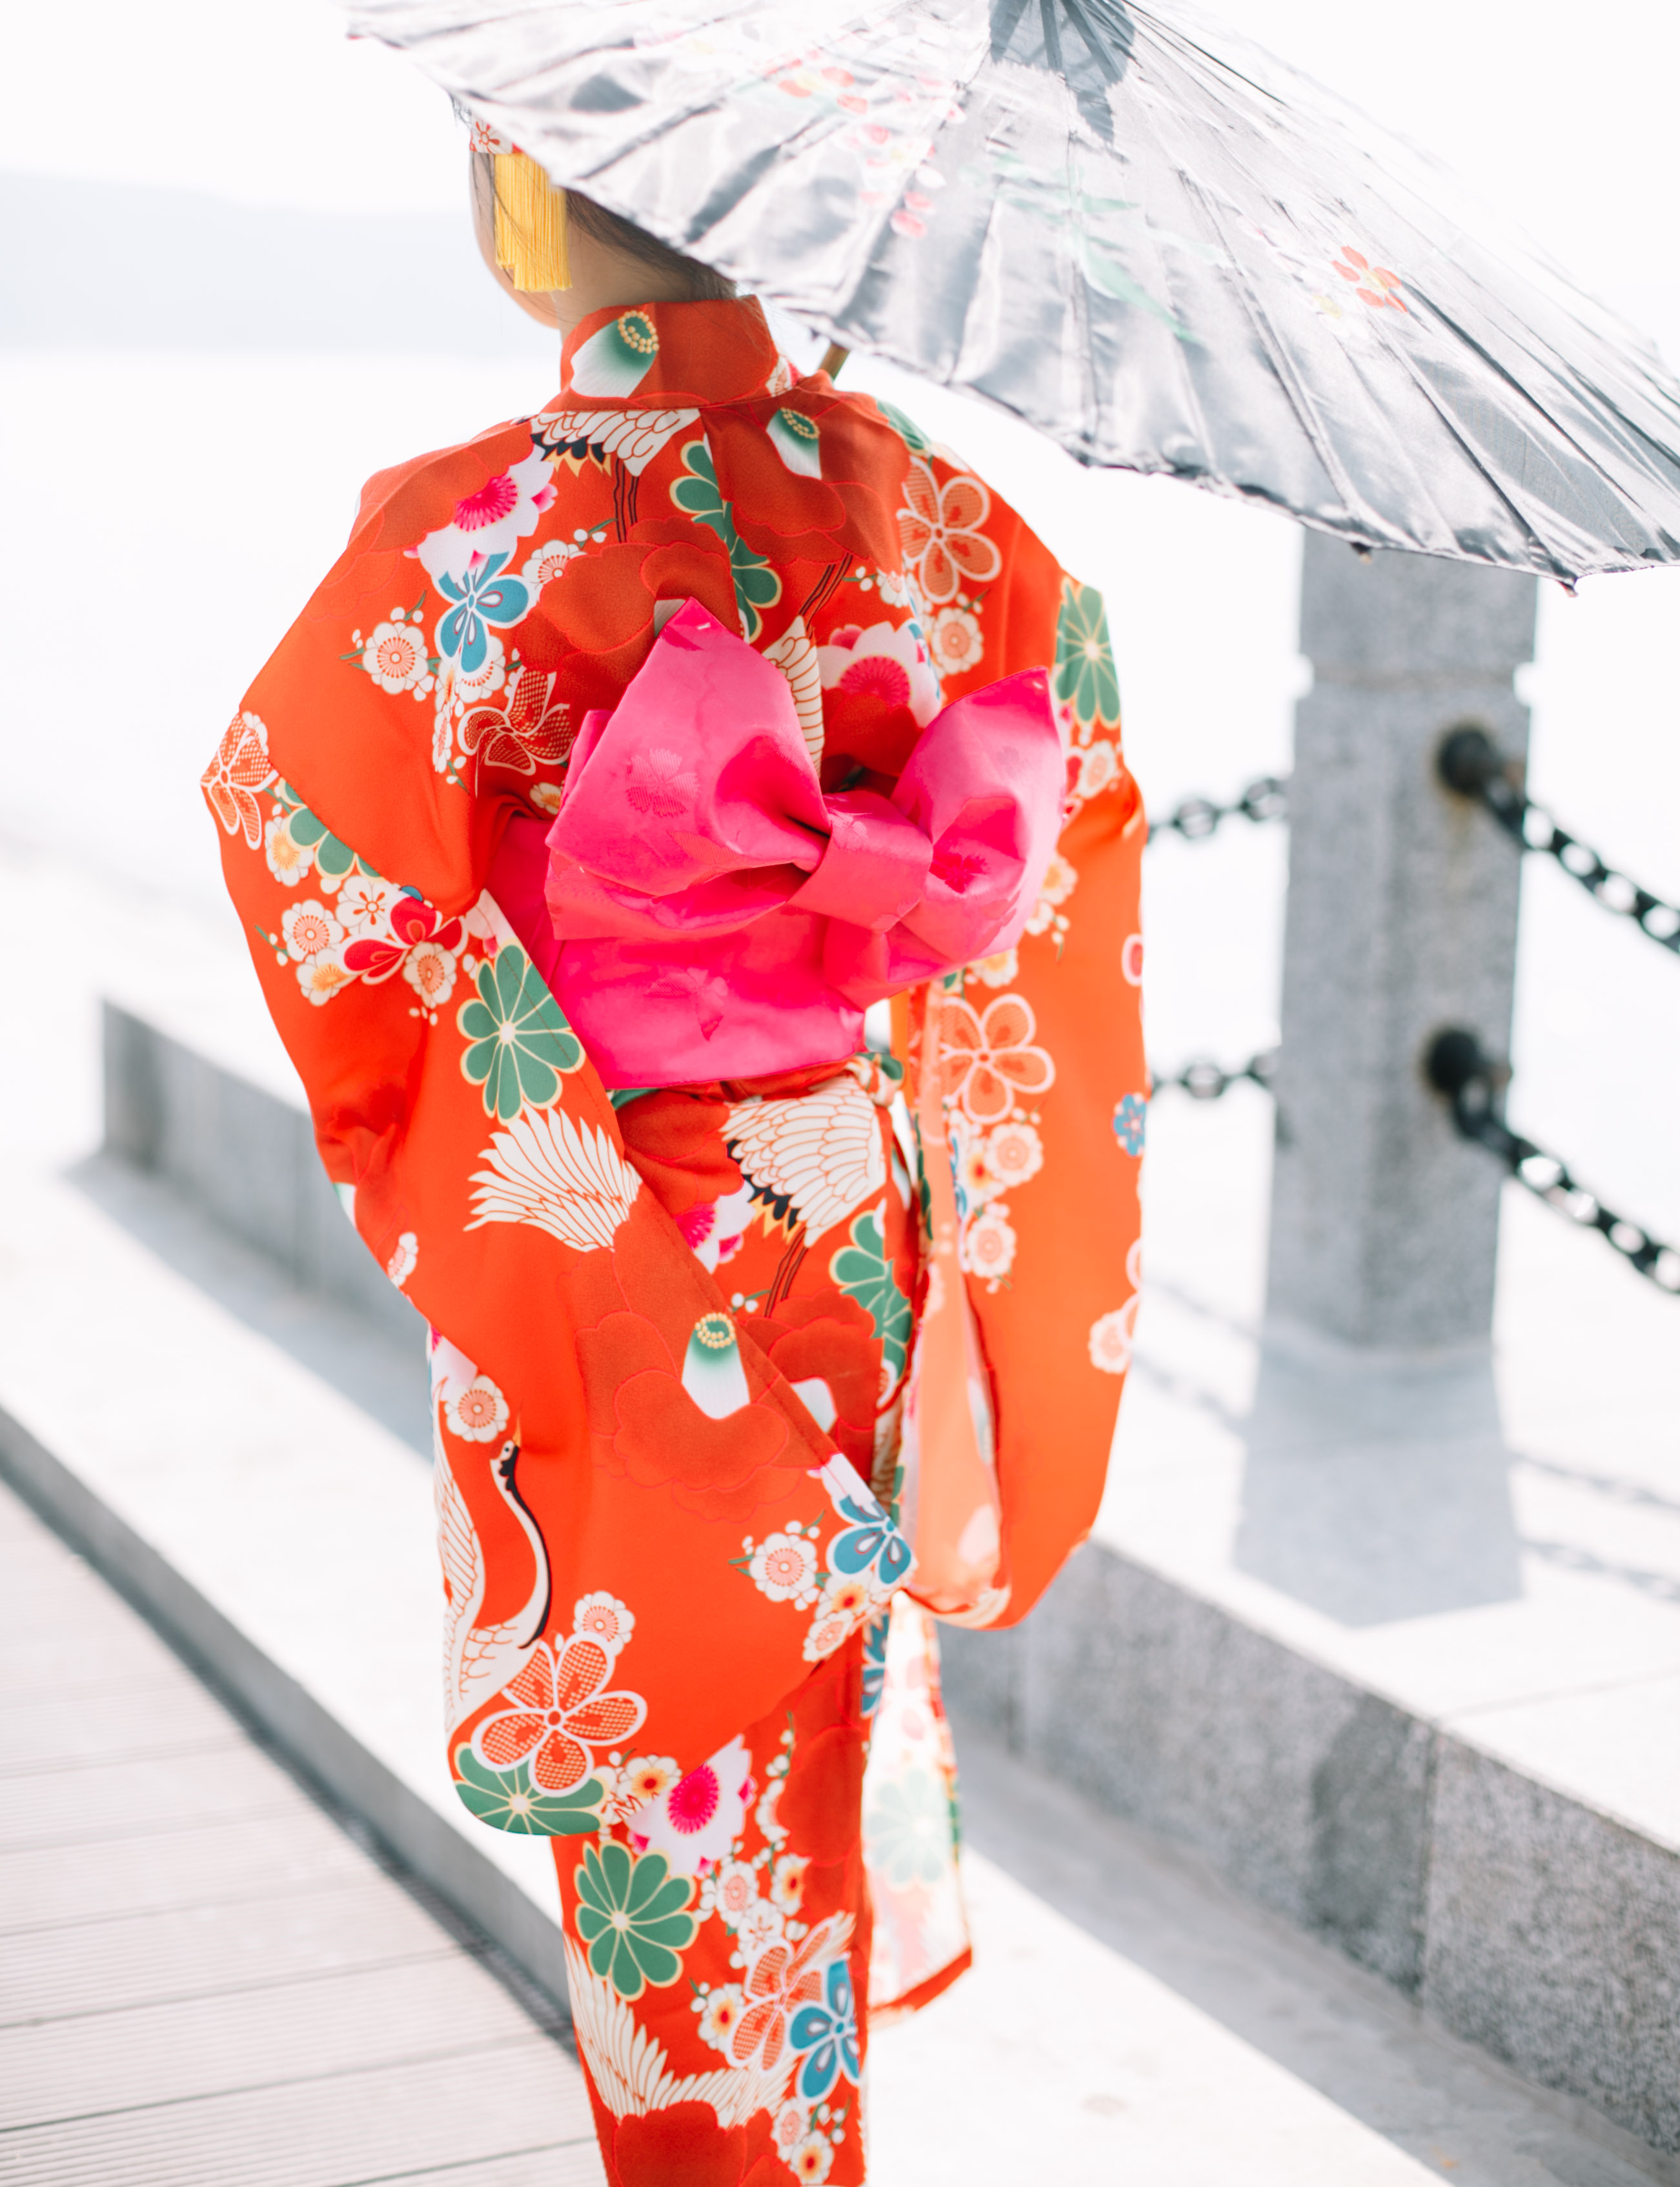 2019 new black japanese national baby girl kimono dress children yukata with obi kid girl performance dance dress flower2019 new black japanese national baby girl kimono dress children yukata with obi kid girl performance dance dress flower